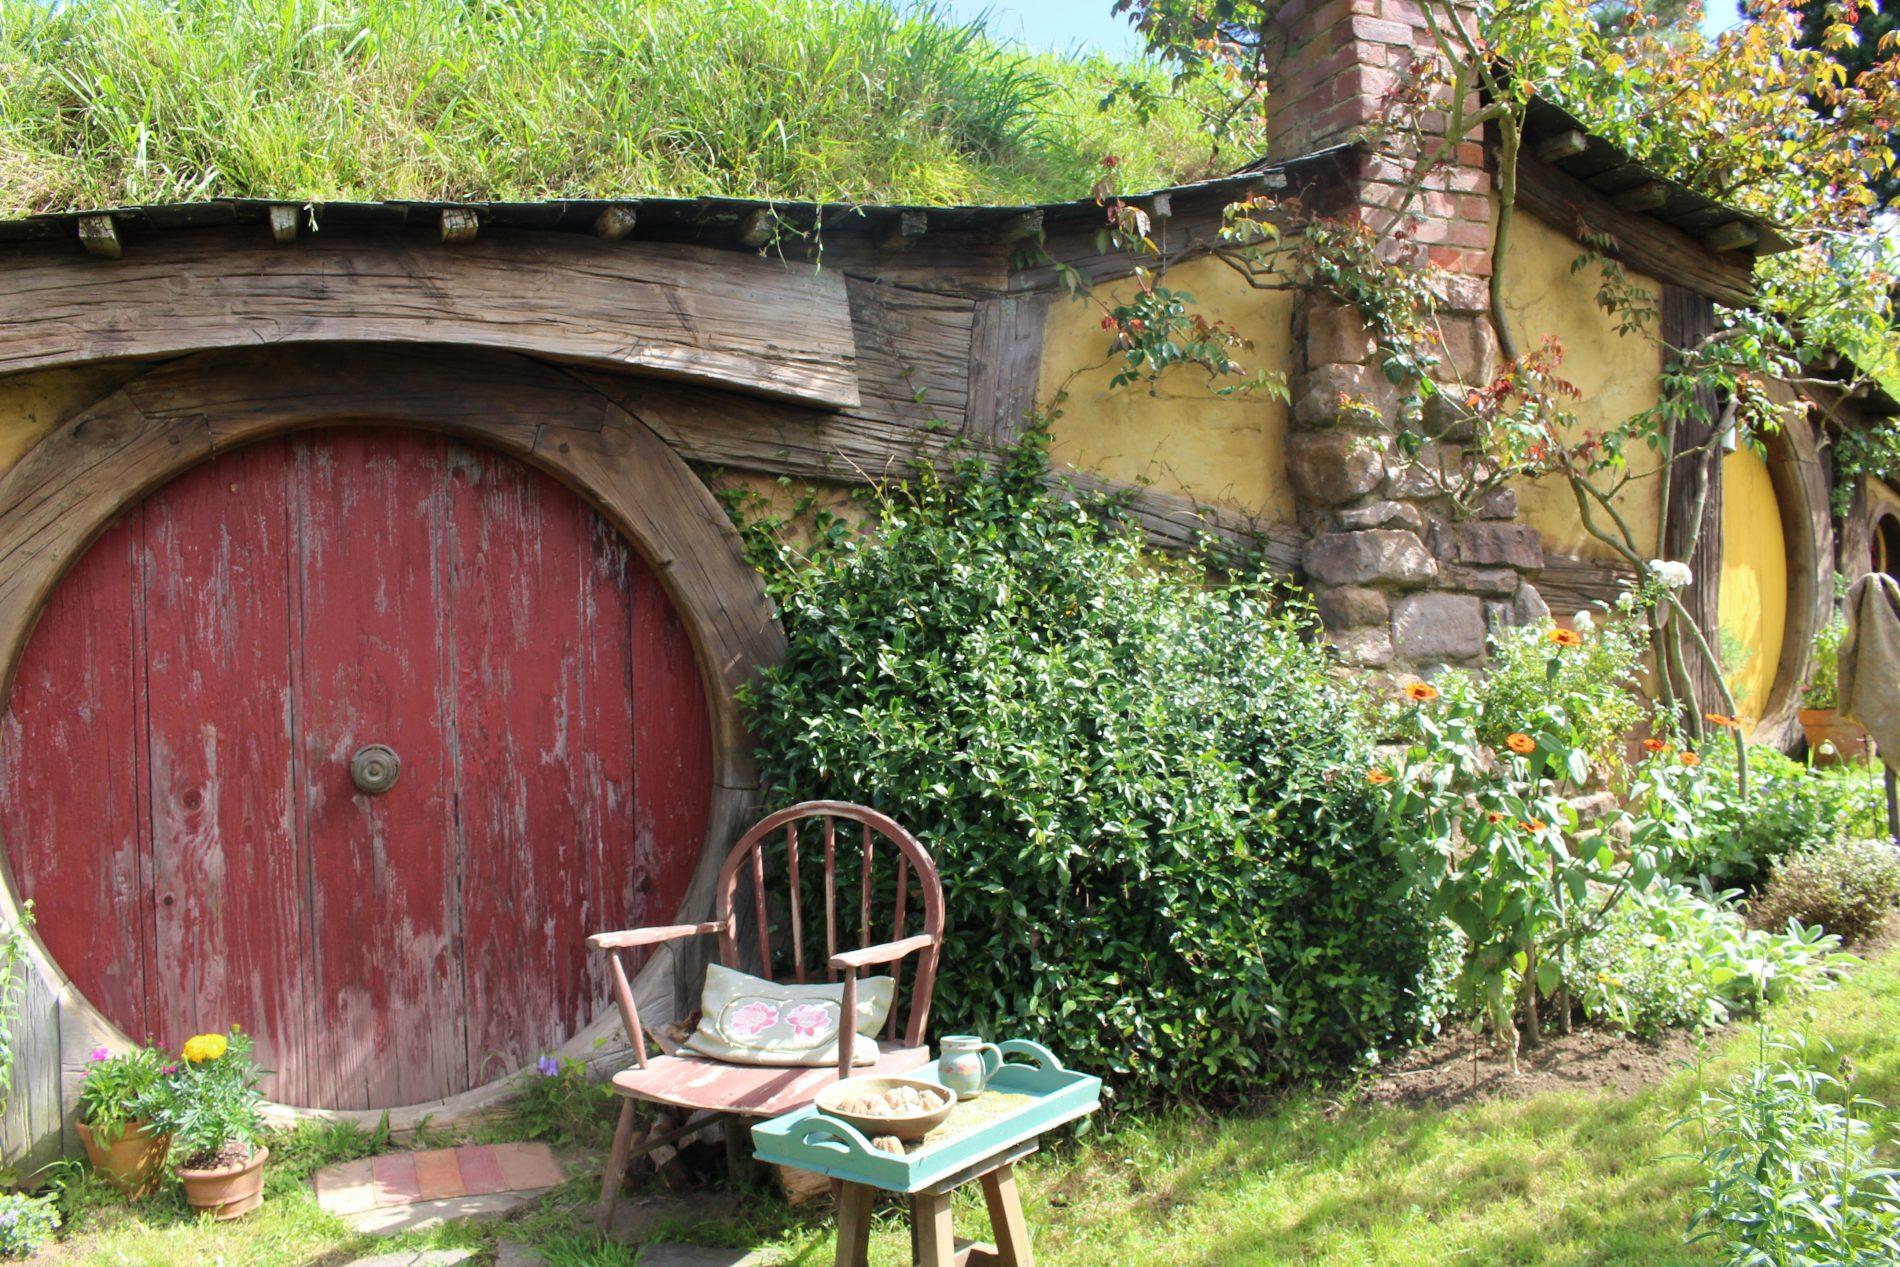 hobbiton, new zealand, movie set